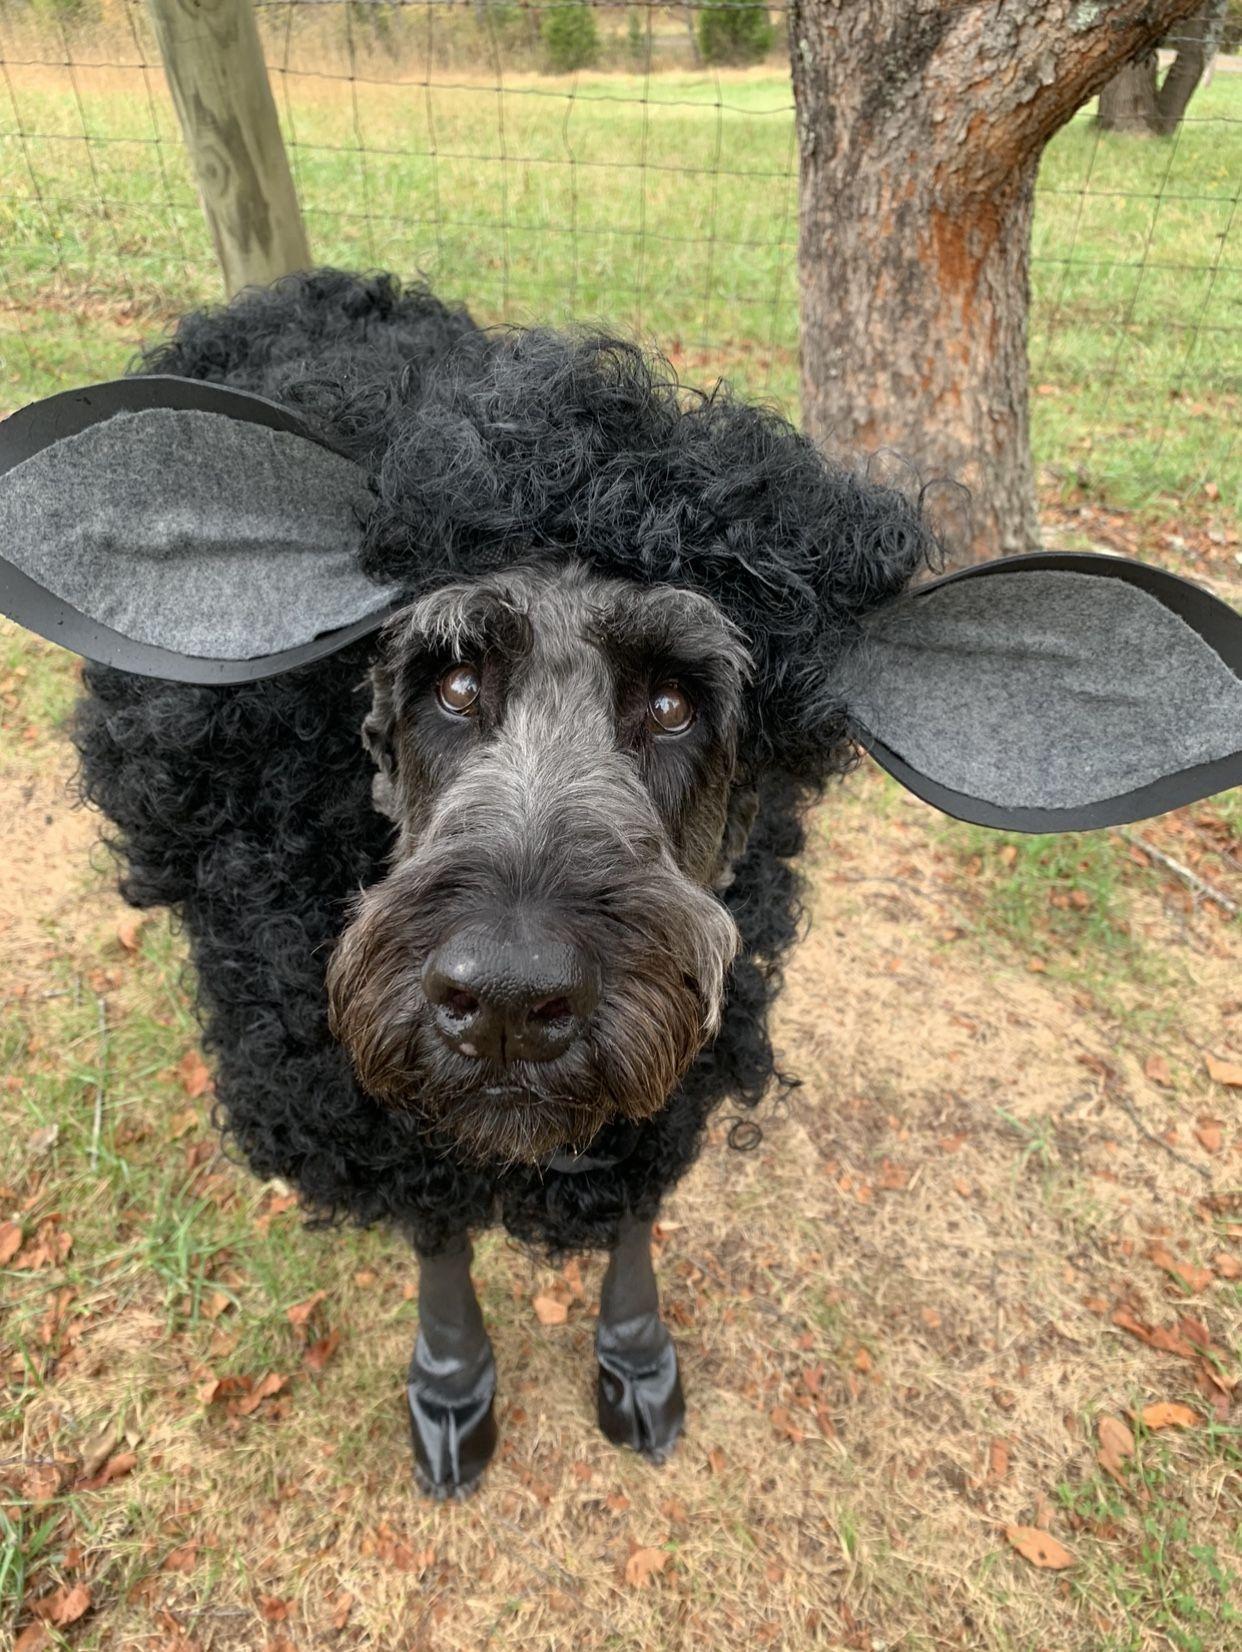 DIY sheep costume for dogs  #sheepcostume Insta @giantbosleyschnoodle #sheepcostume DIY sheep costume for dogs  #sheepcostume Insta @giantbosleyschnoodle #sheepcostume DIY sheep costume for dogs  #sheepcostume Insta @giantbosleyschnoodle #sheepcostume DIY sheep costume for dogs  #sheepcostume Insta @giantbosleyschnoodle #sheepcostume DIY sheep costume for dogs  #sheepcostume Insta @giantbosleyschnoodle #sheepcostume DIY sheep costume for dogs  #sheepcostume Insta @giantbosleyschnoodle #sheepcost #sheepcostume